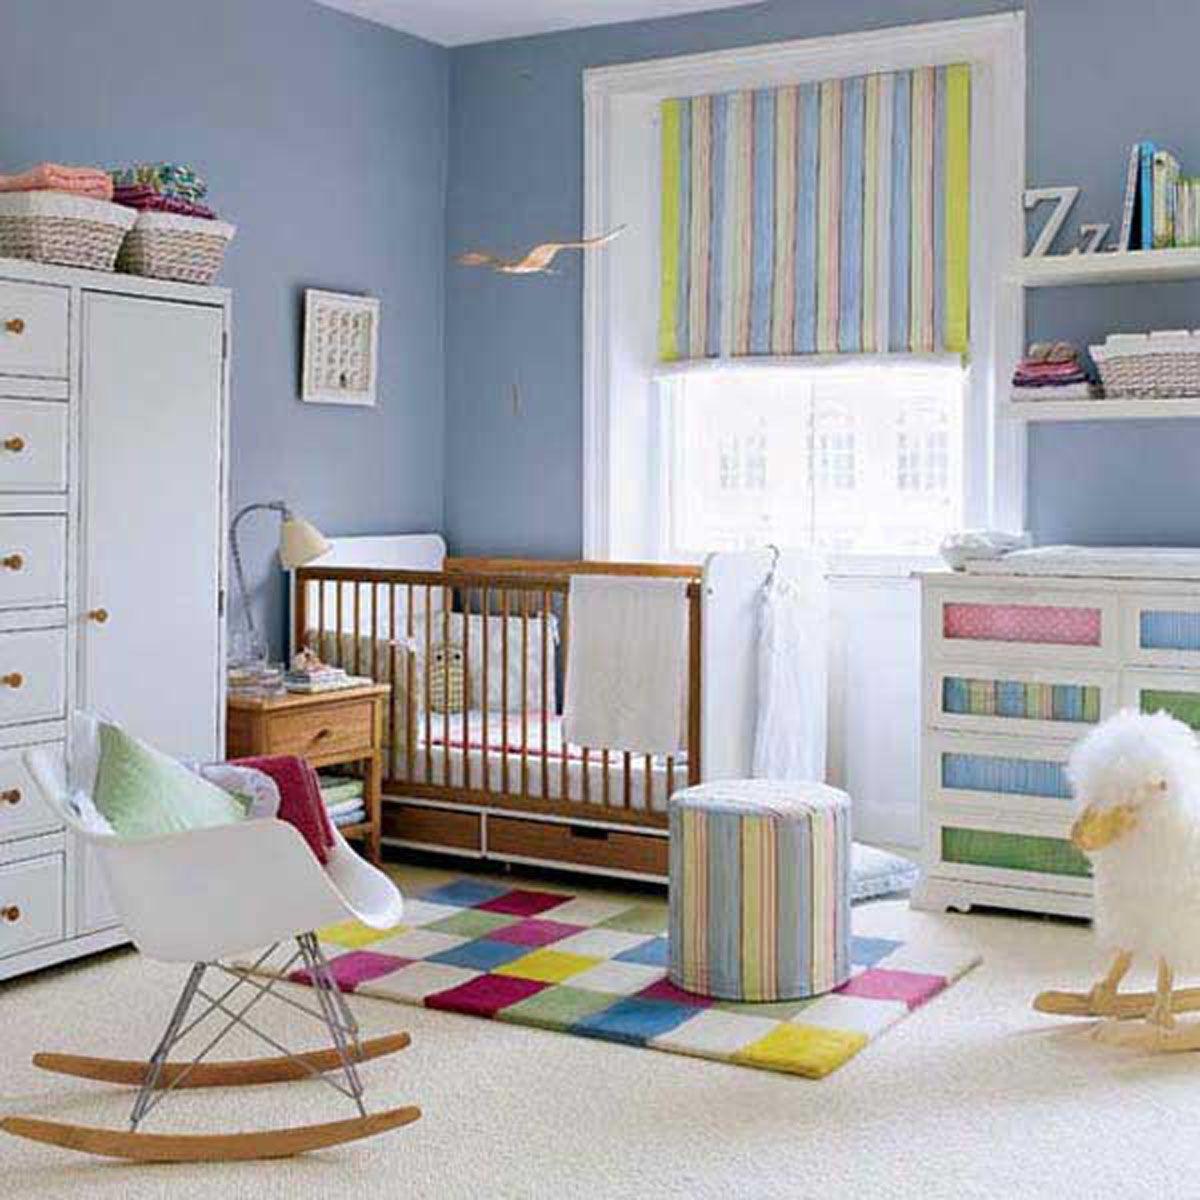 newborn room design Home Kids Pinterest Room ideas Baby